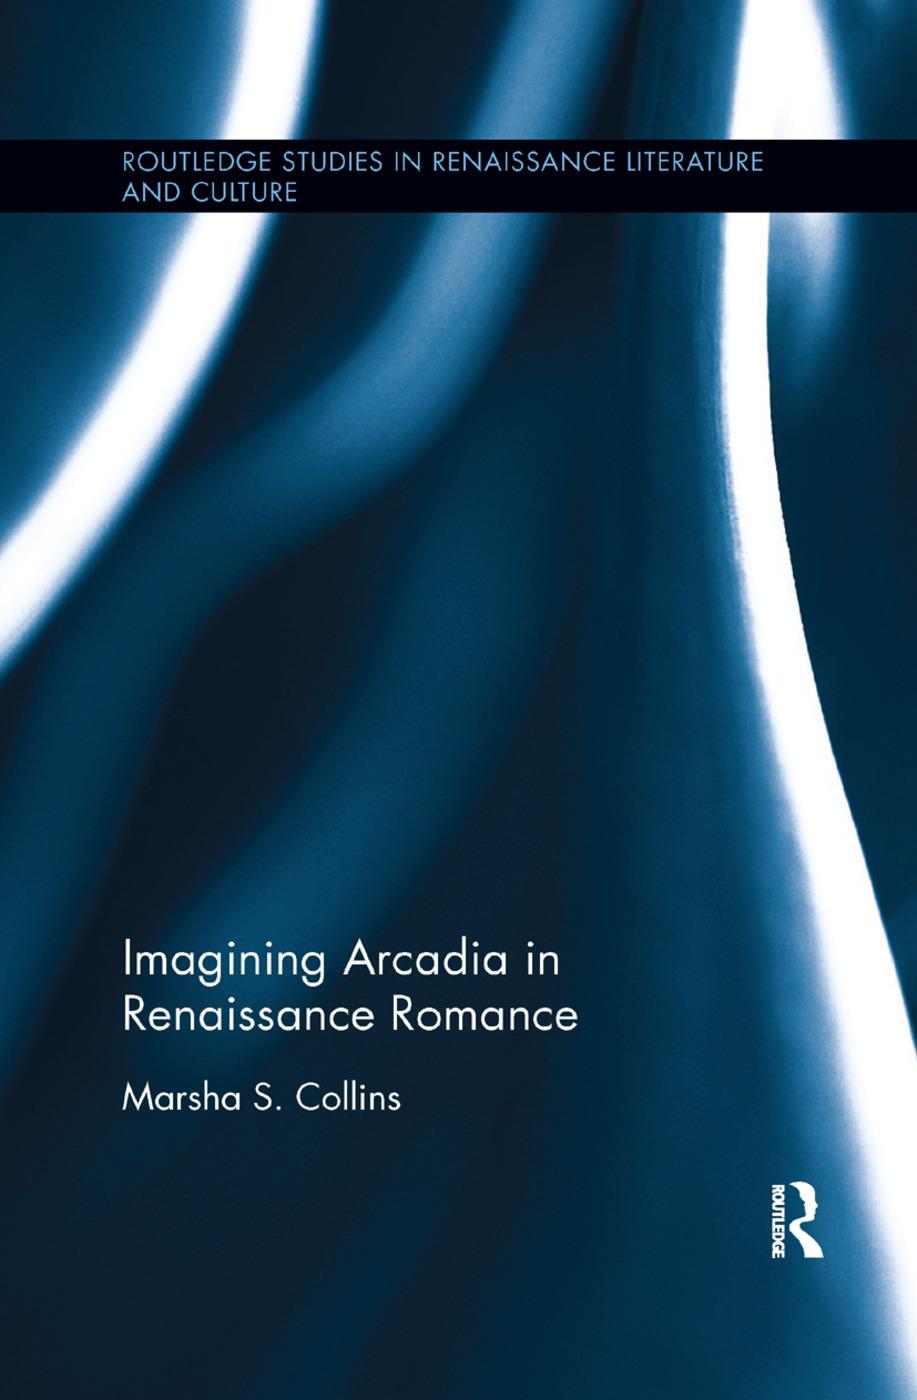 Imagining Arcadia in Renaissance Romance